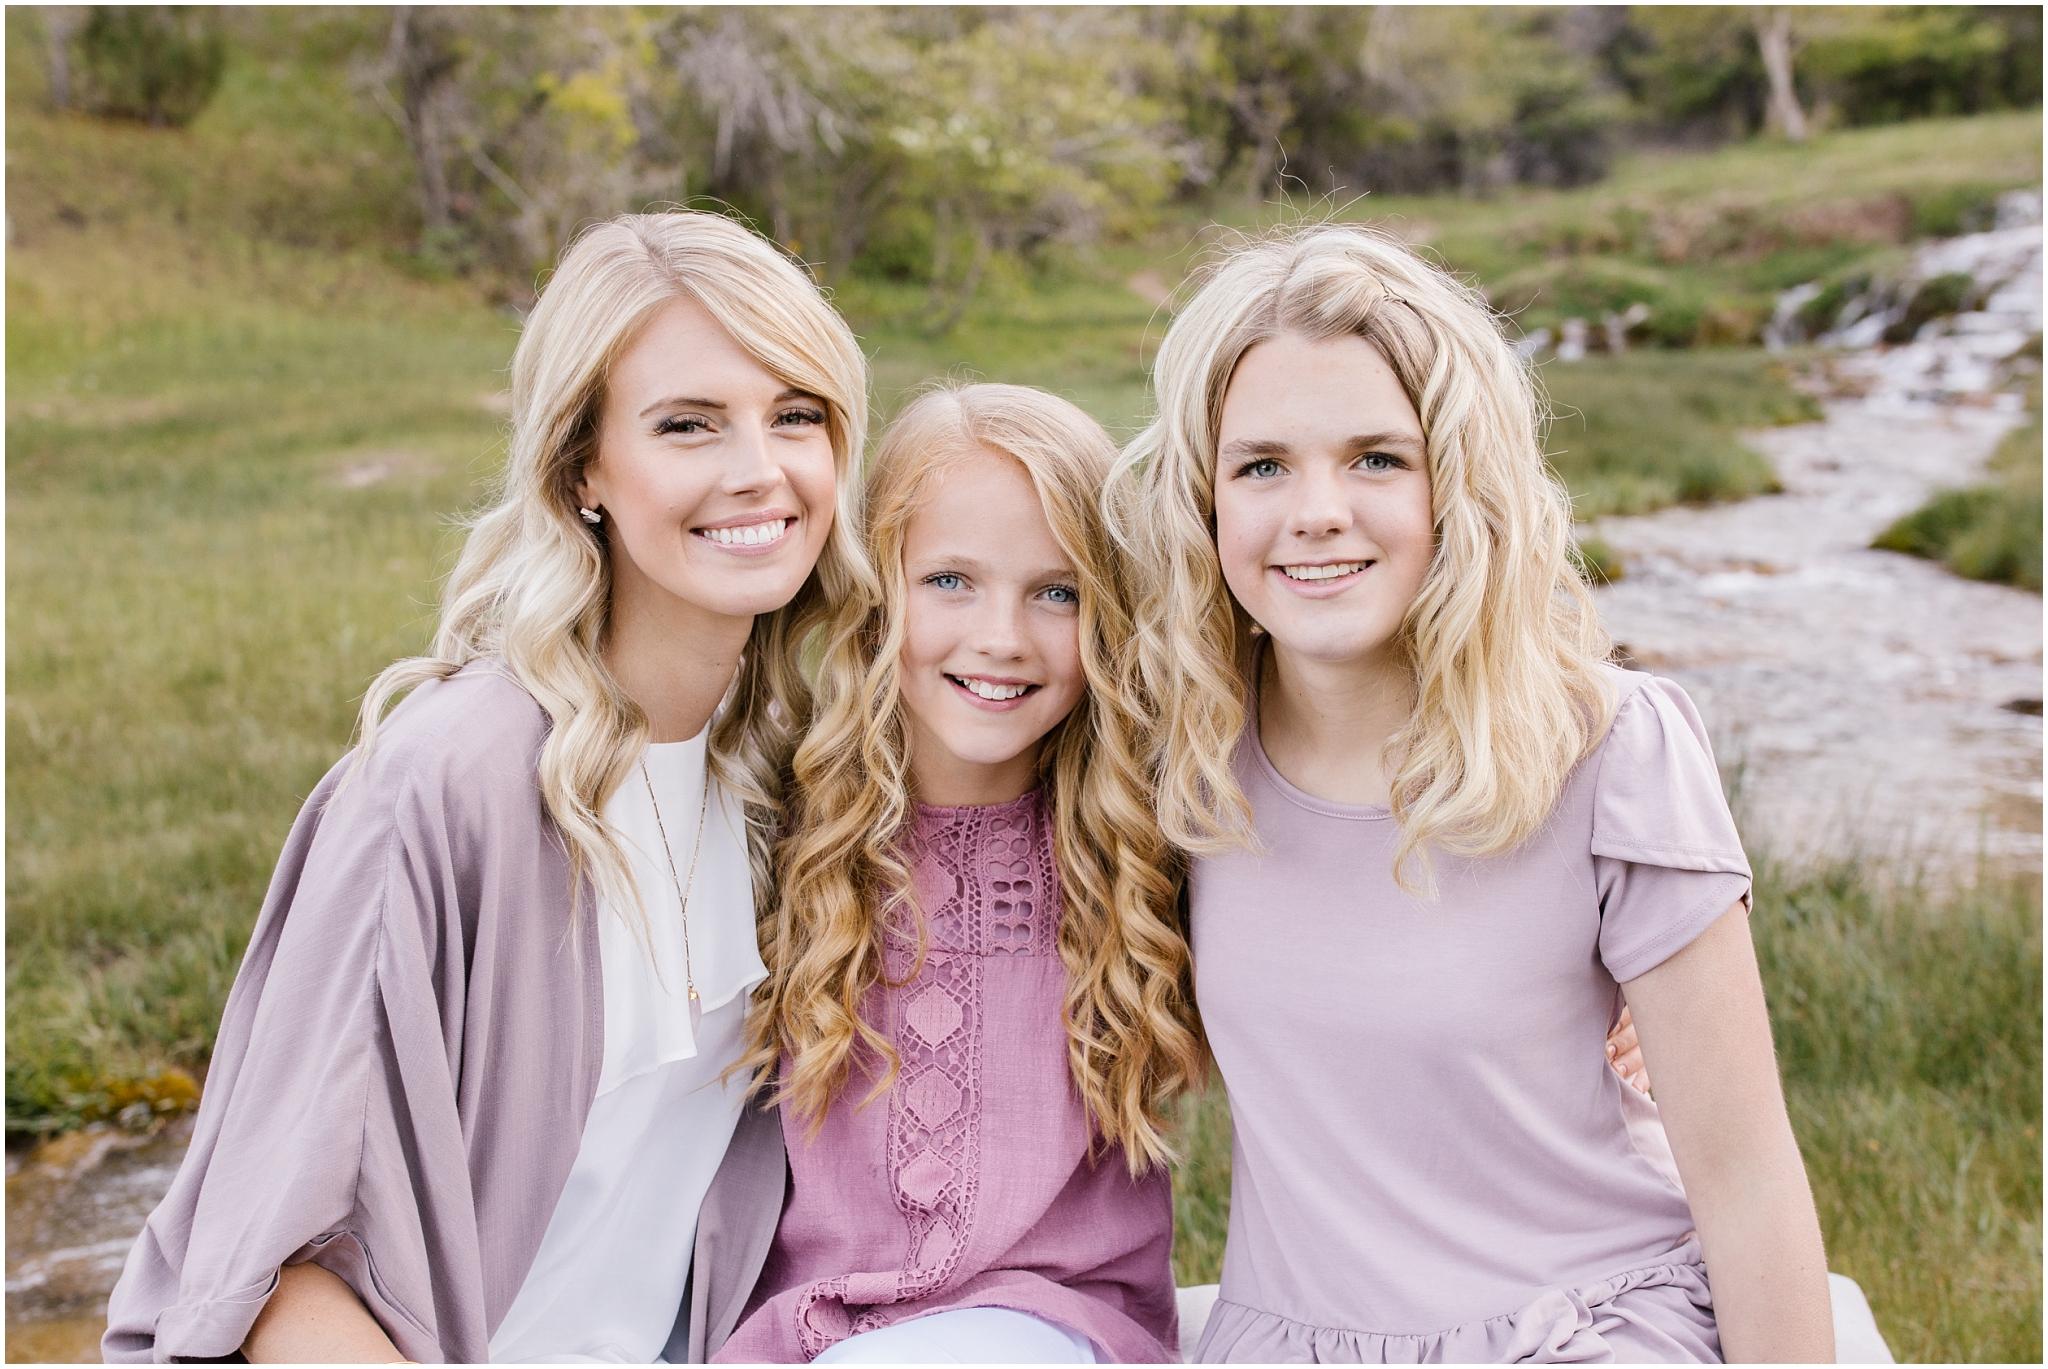 Bagley-119_Lizzie-B-Imagery-Utah-Family-Photographer-Central-Utah-Photographer-Utah-County-Extended-Family.jpg